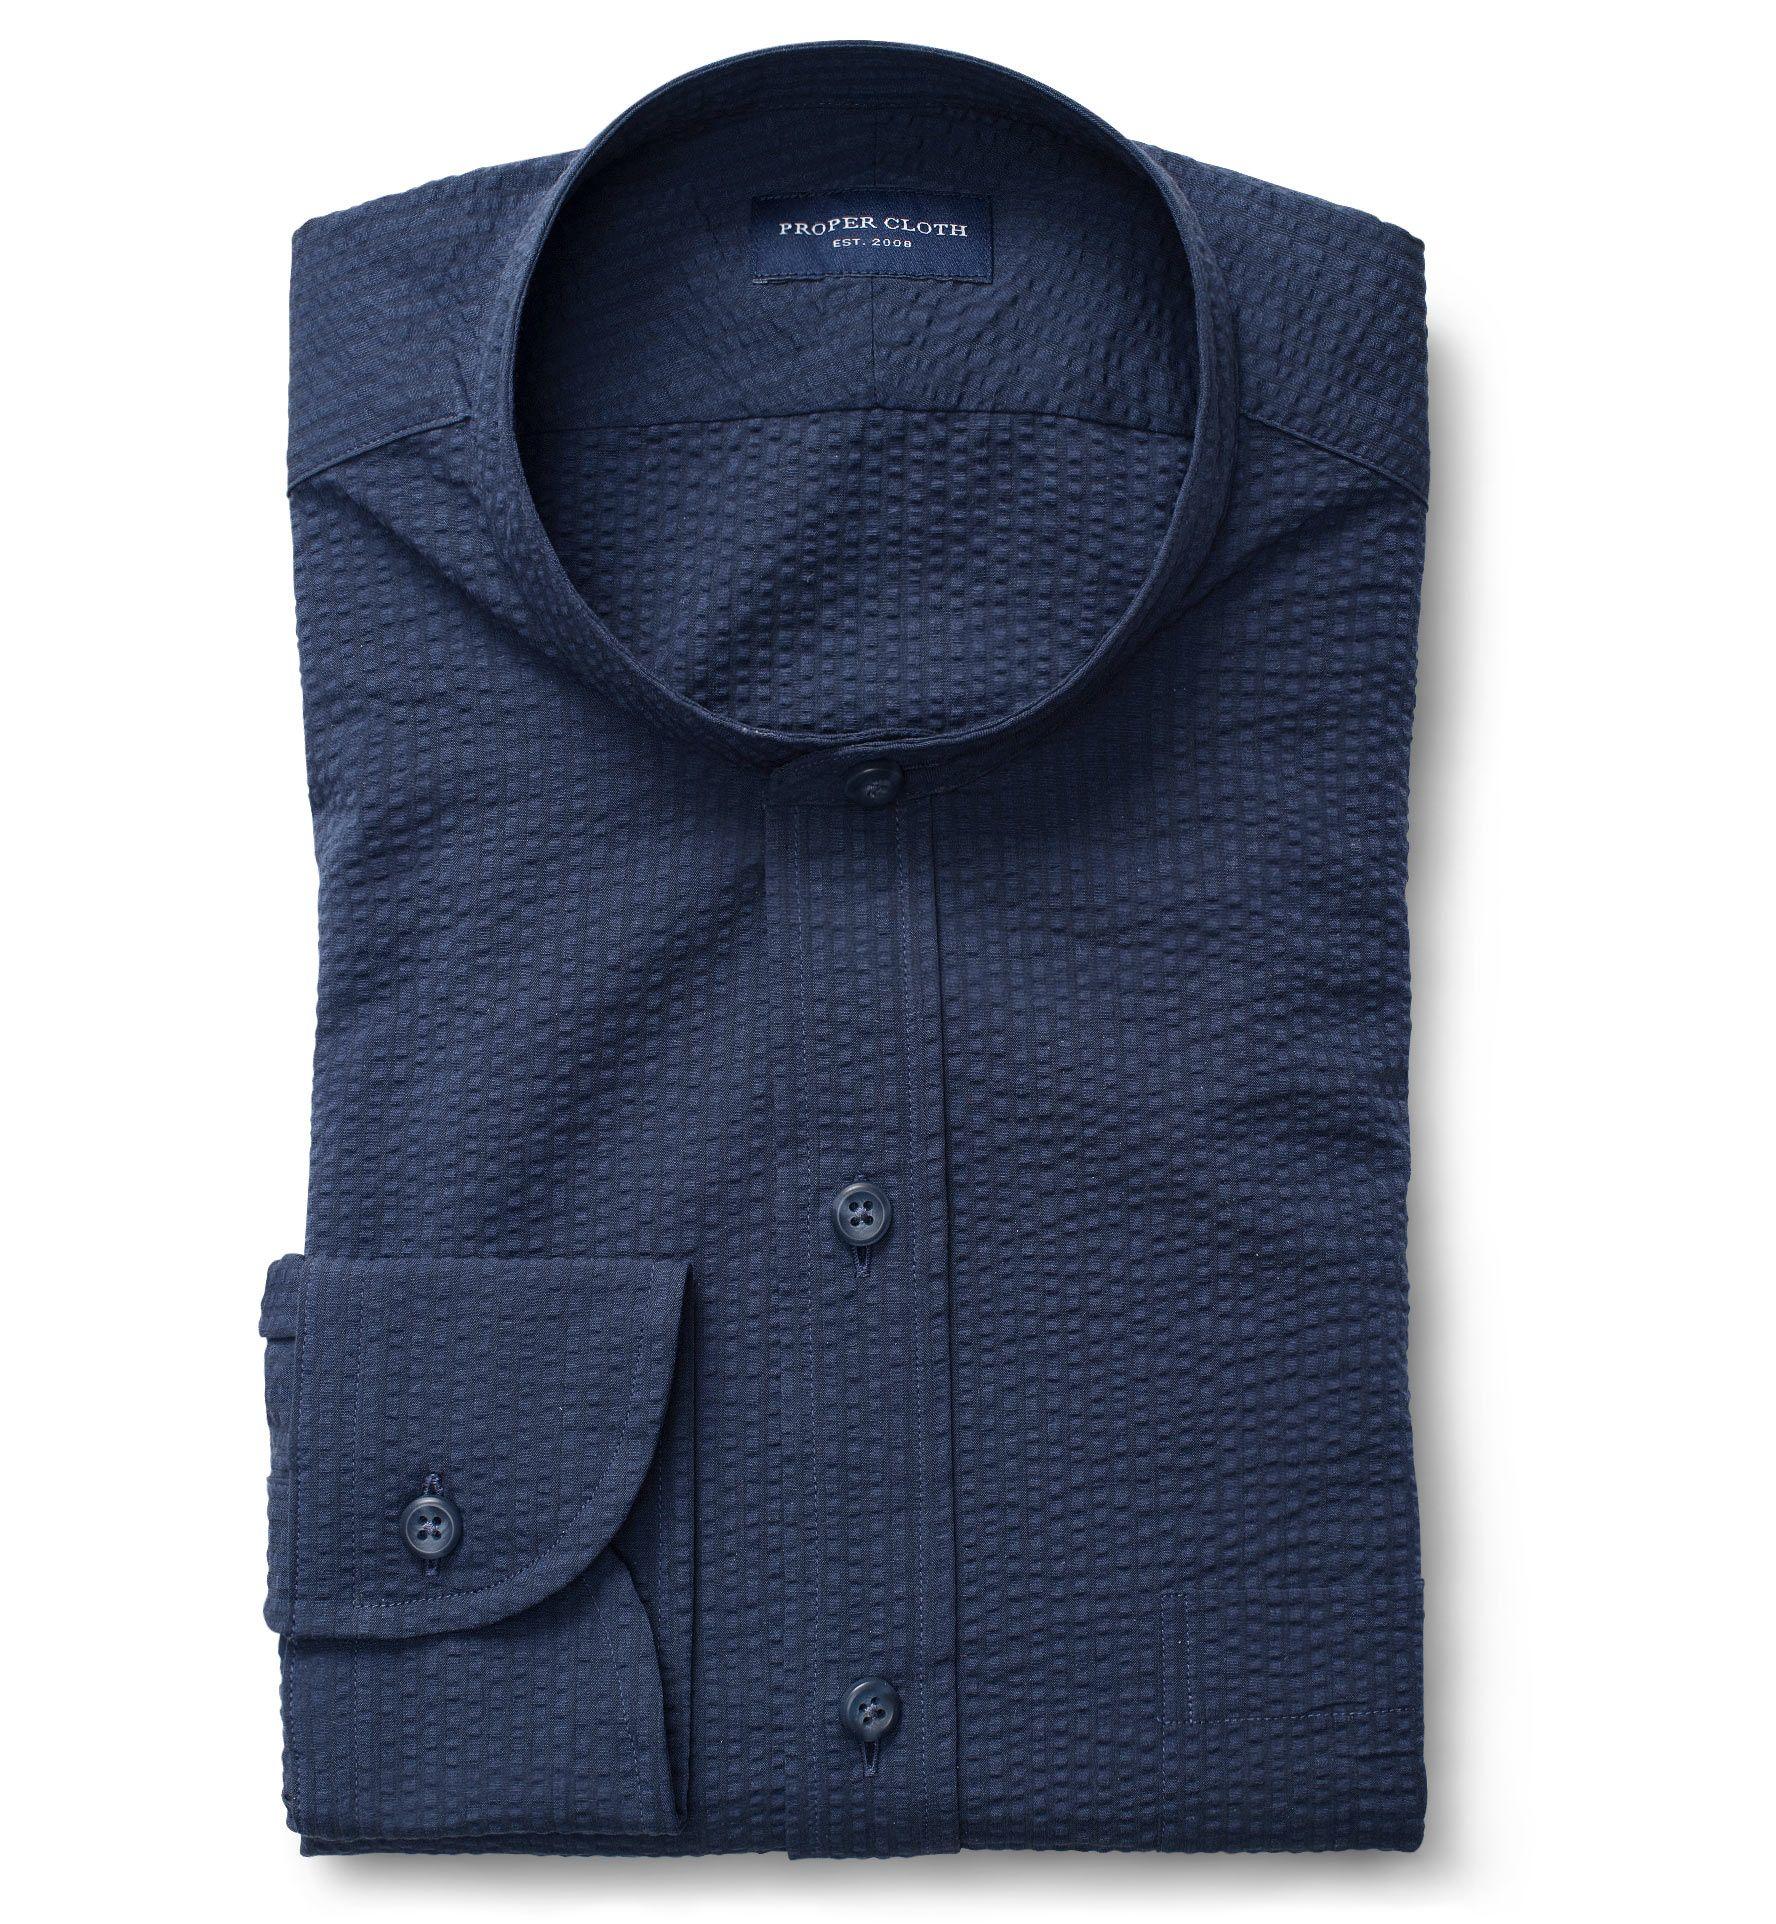 Portuguese Navy Seersucker Shirt casual style, Custom